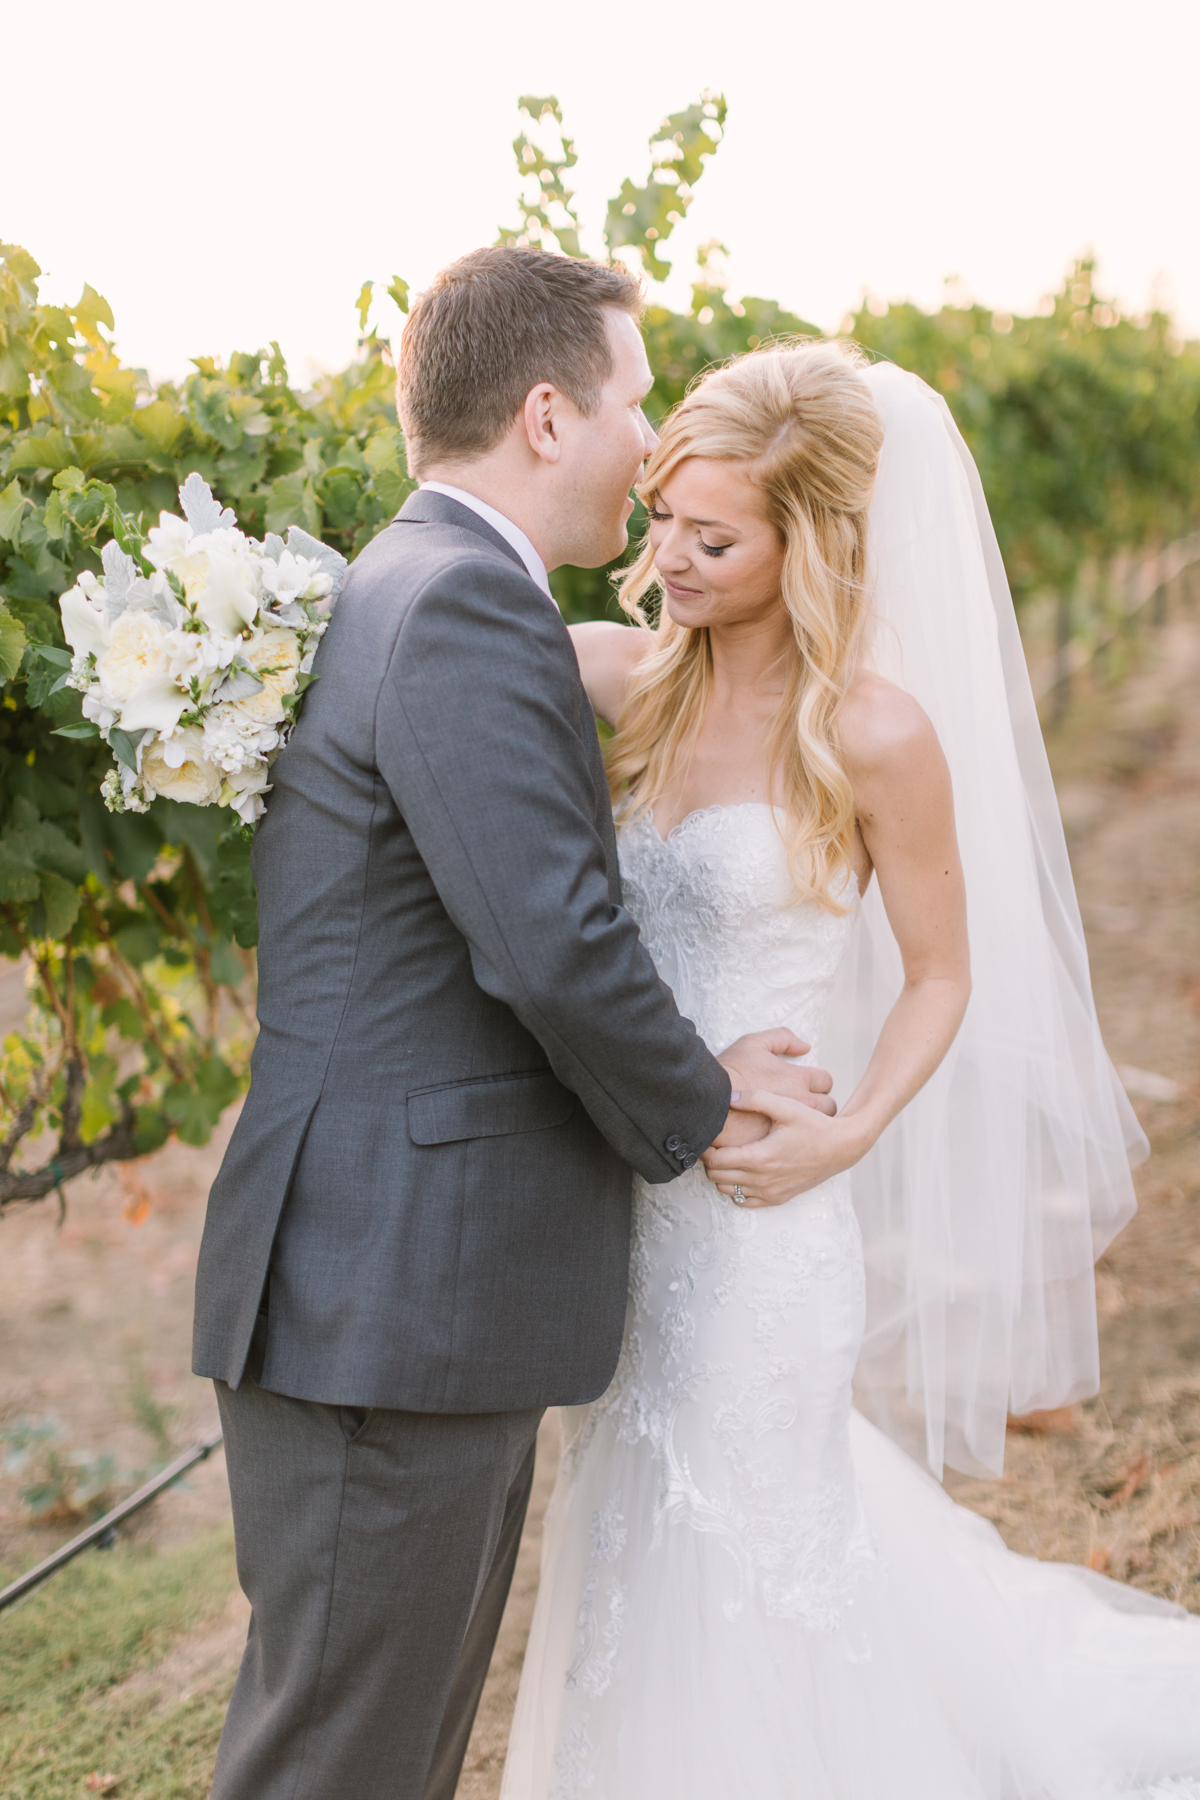 Orange-County-Wedding-Photography-Brianna-Caster-and-Co-Photographers-Falkner-Winery-Wedding-7